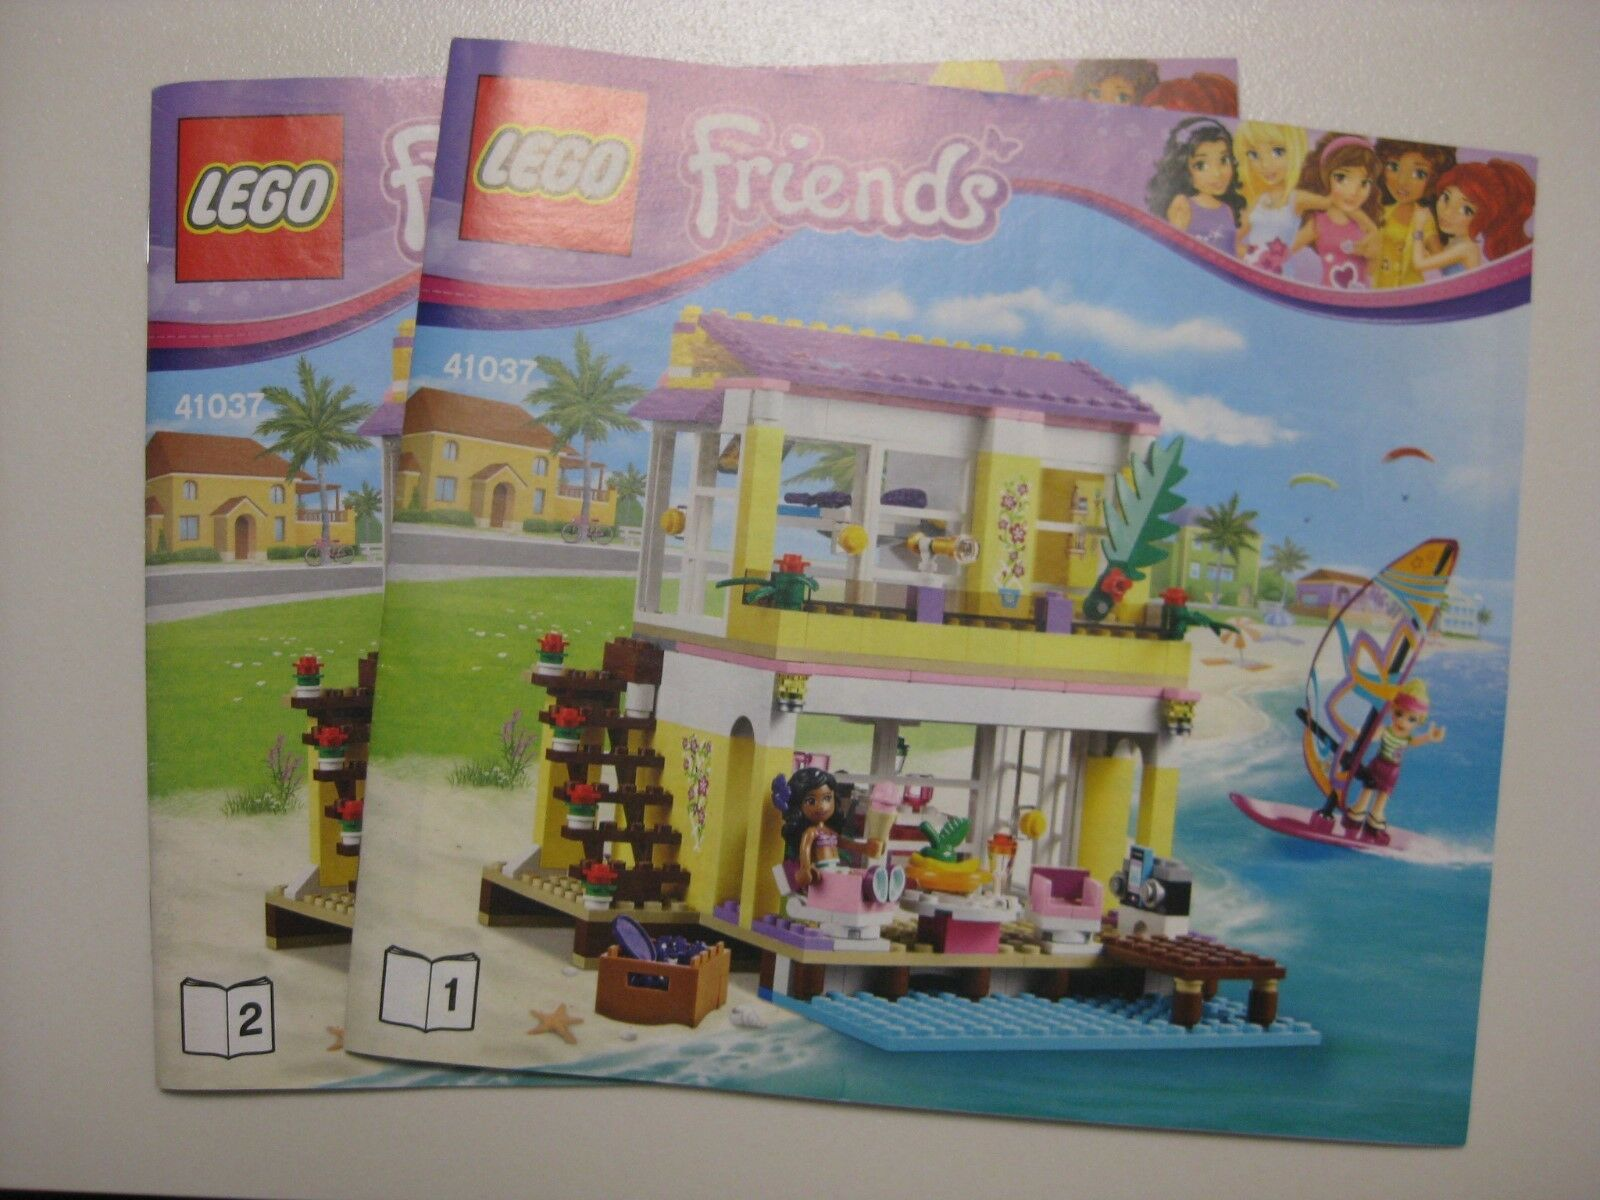 Lego Friends - 41037 - Stephanies Strandhaus